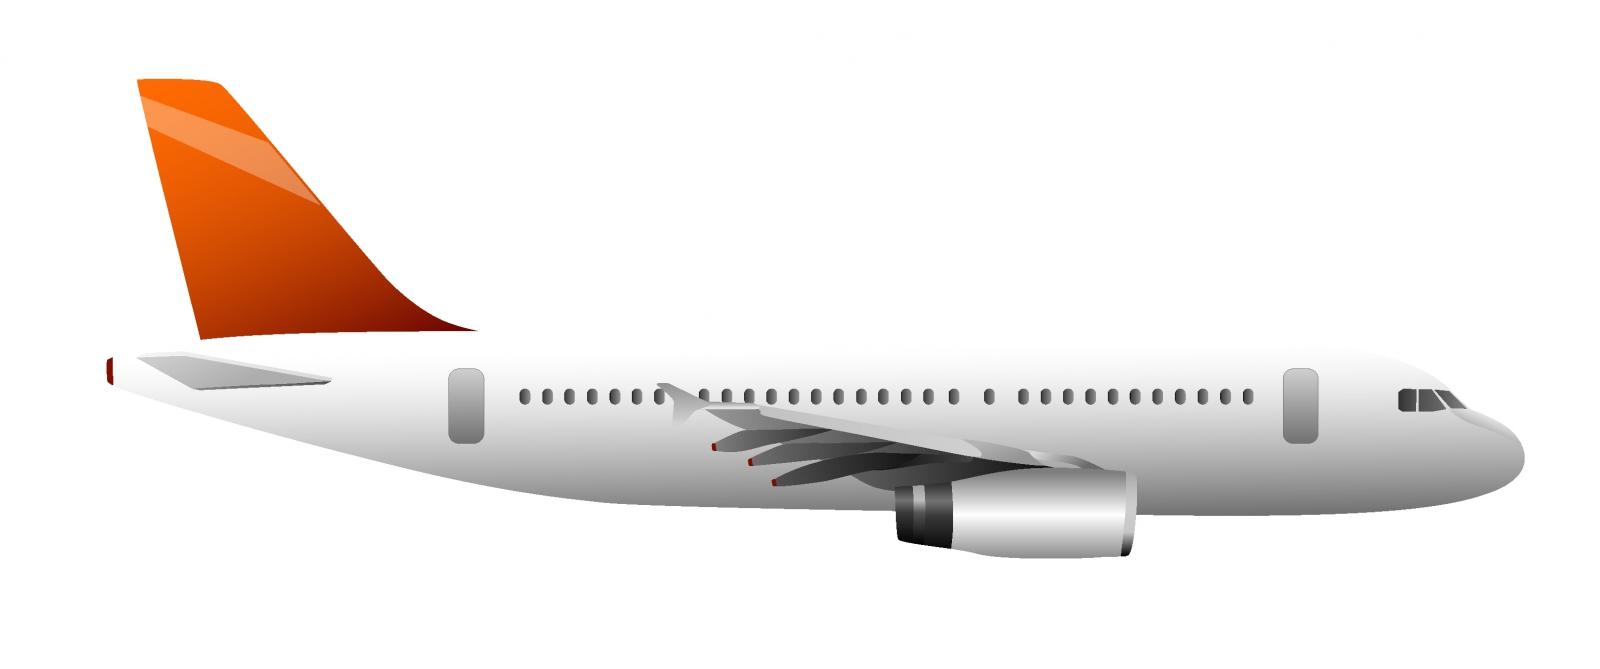 5659 Plane free clipart.